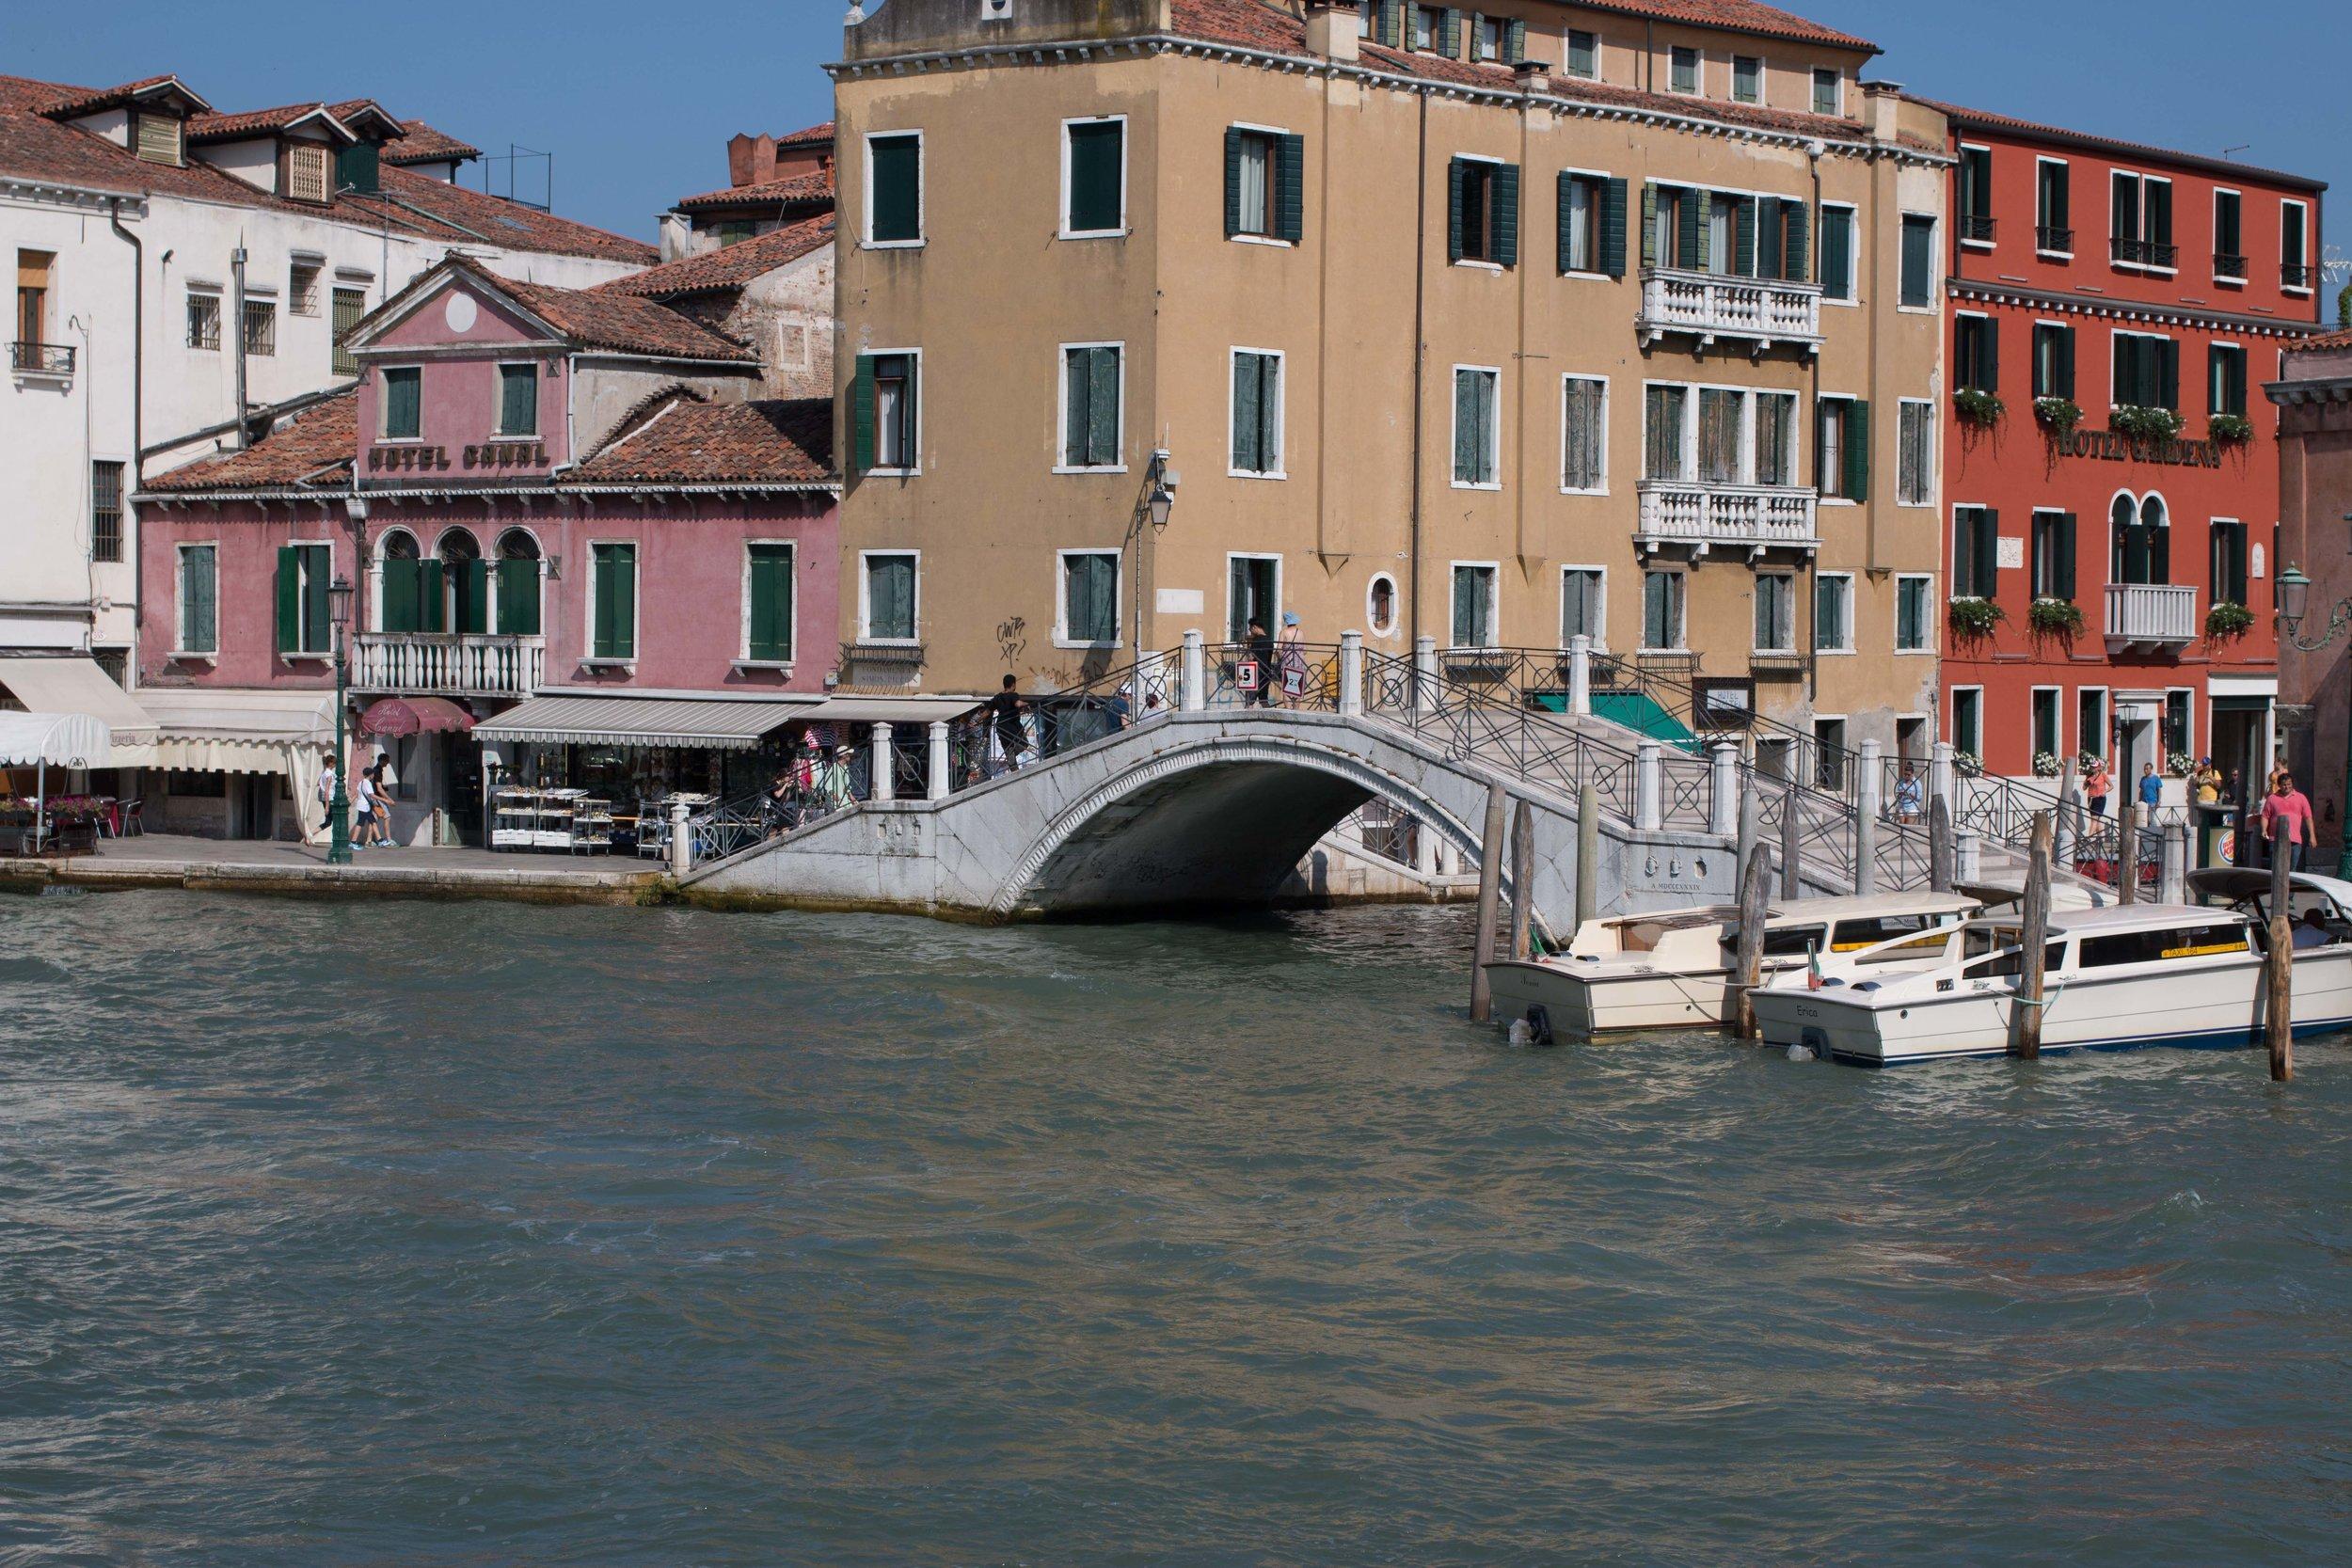 canal_venice_submergedoaks